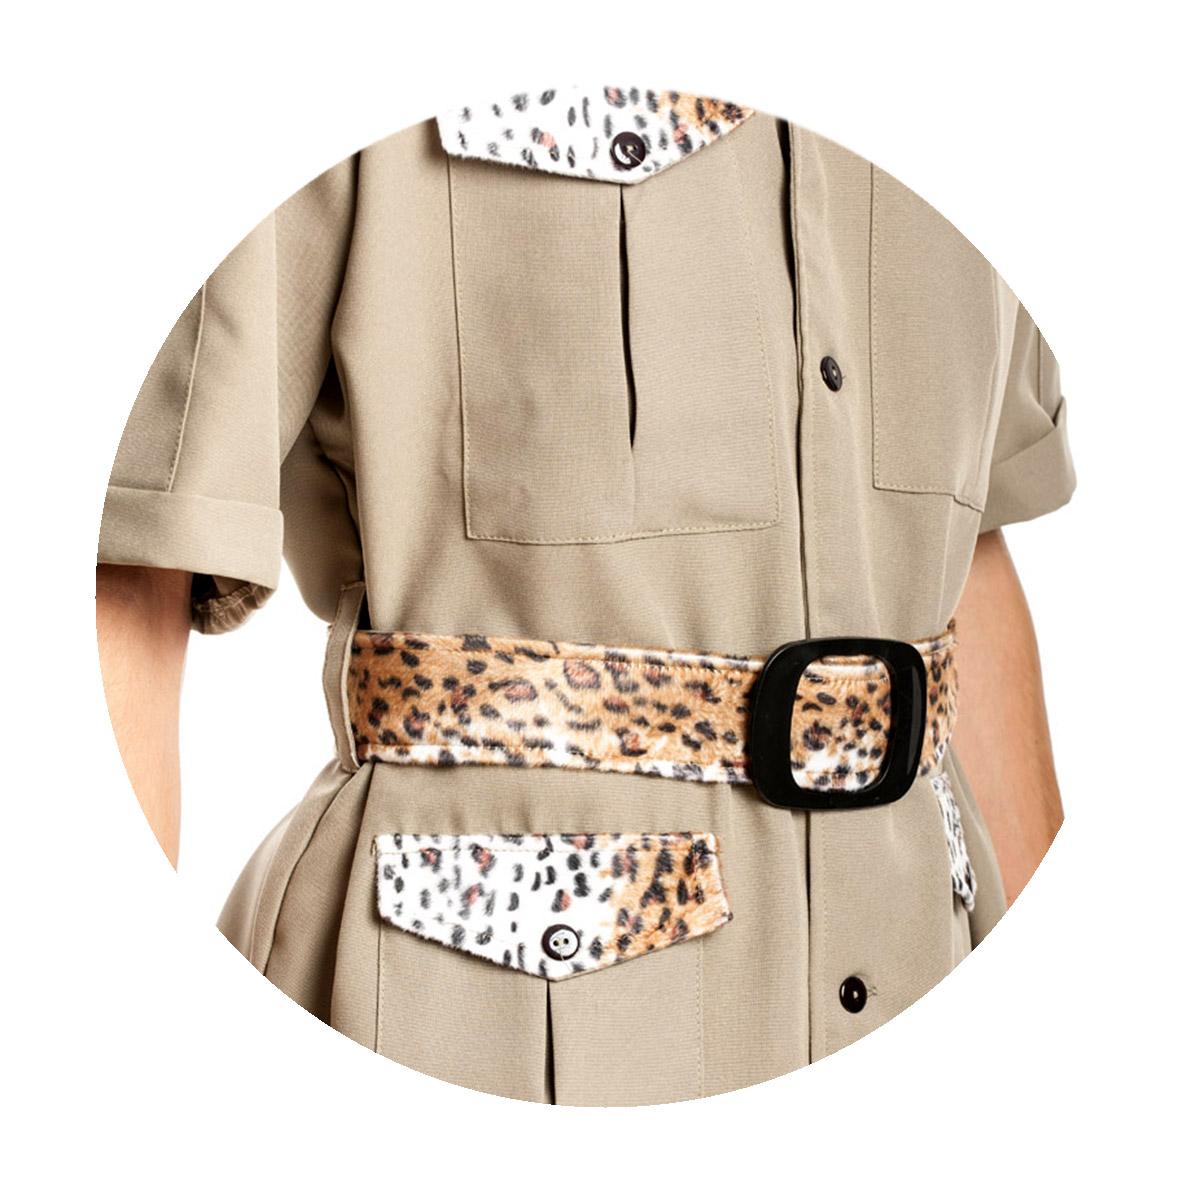 safari kost m herren dschungel uniform entdecker. Black Bedroom Furniture Sets. Home Design Ideas